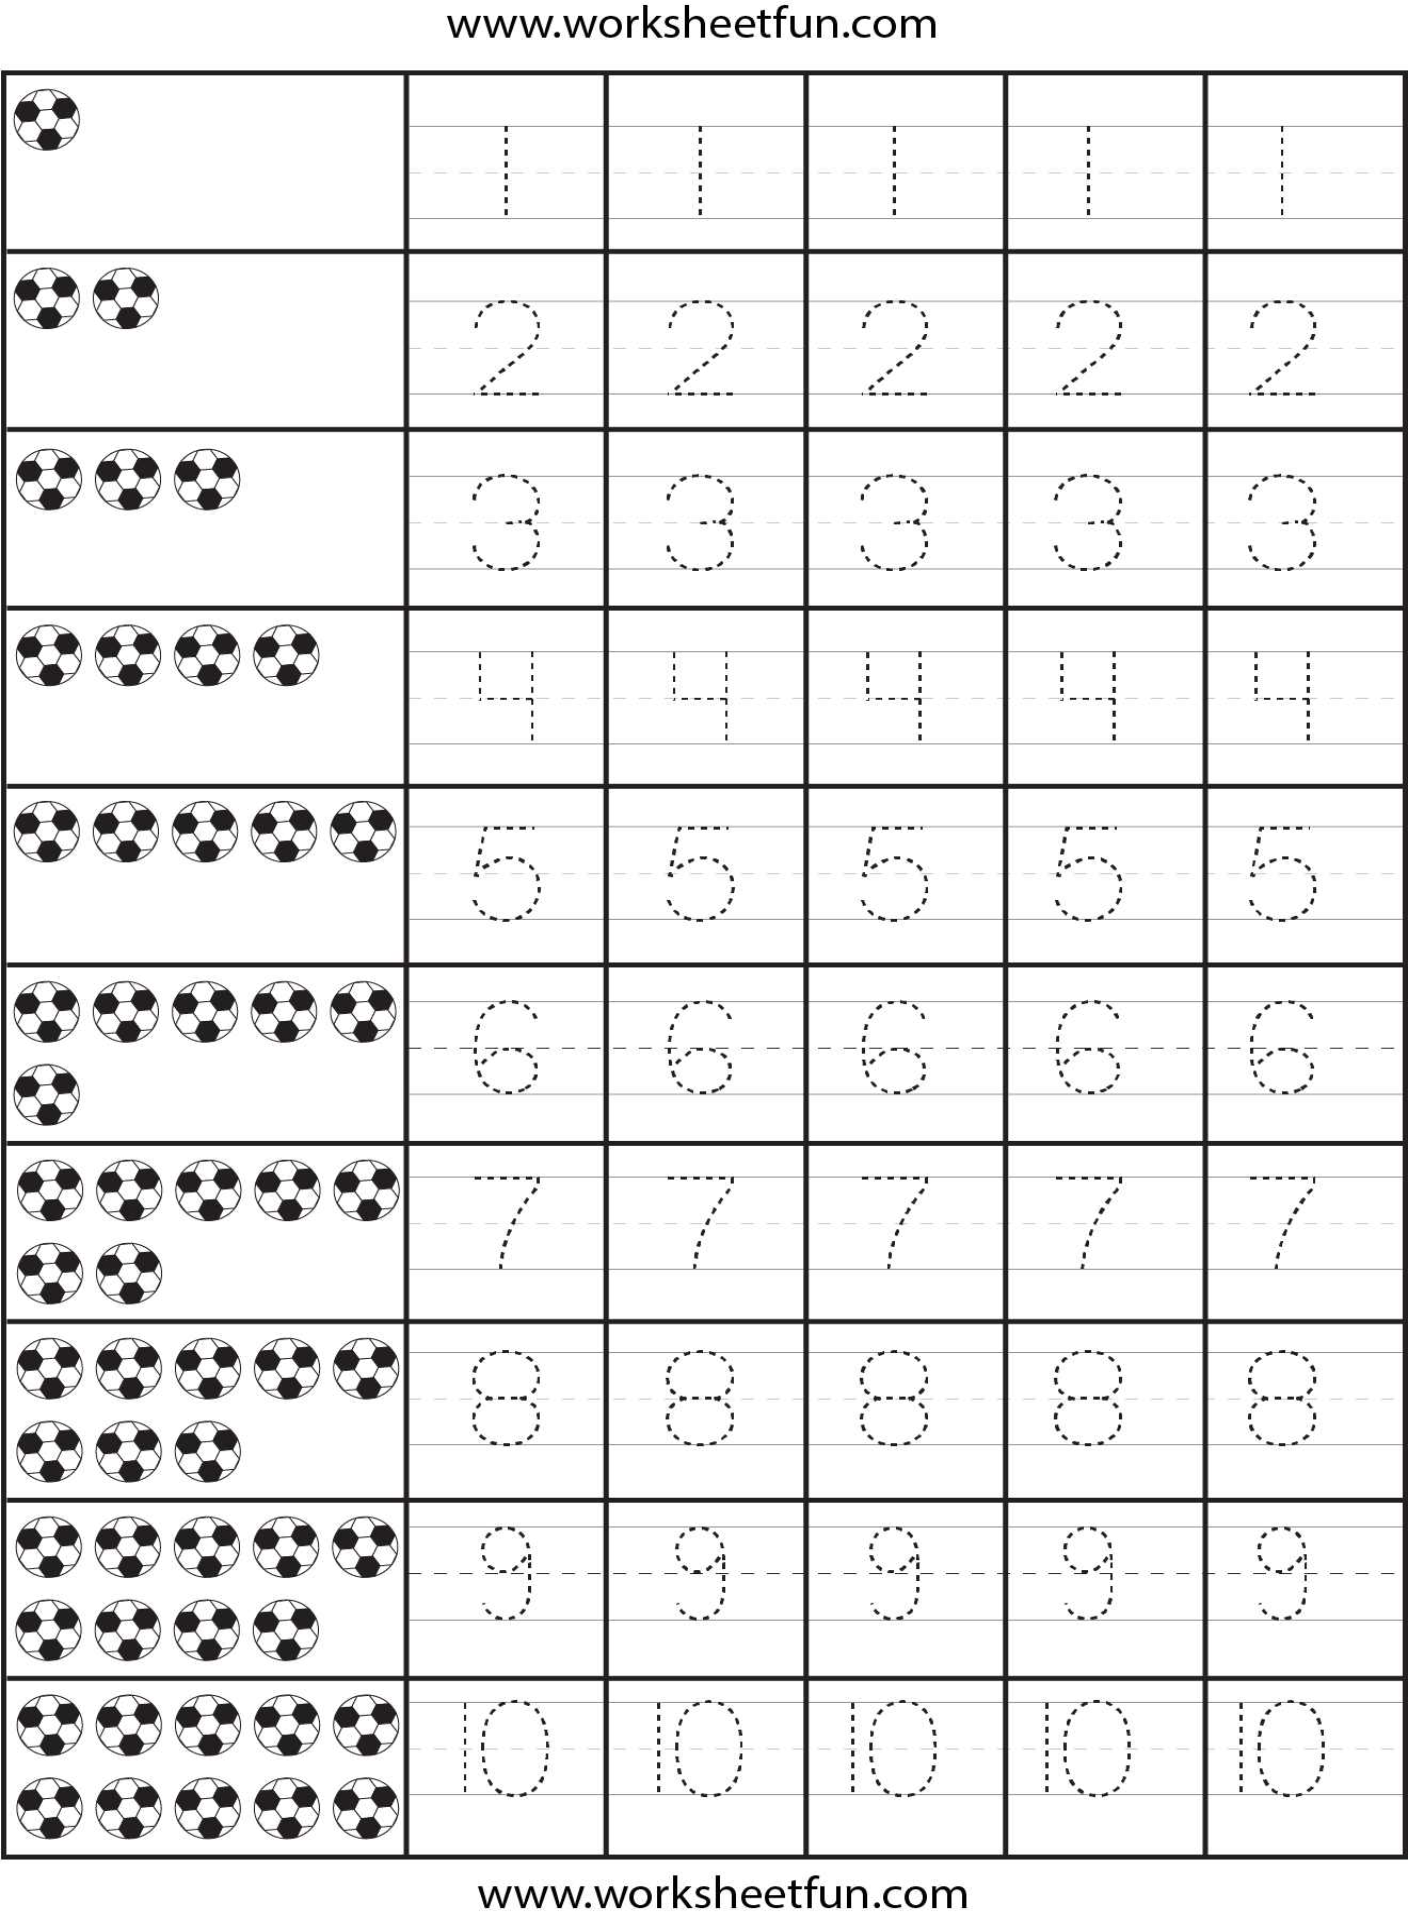 8 Best Images of Printable Number 1 Worksheet - Number One ...